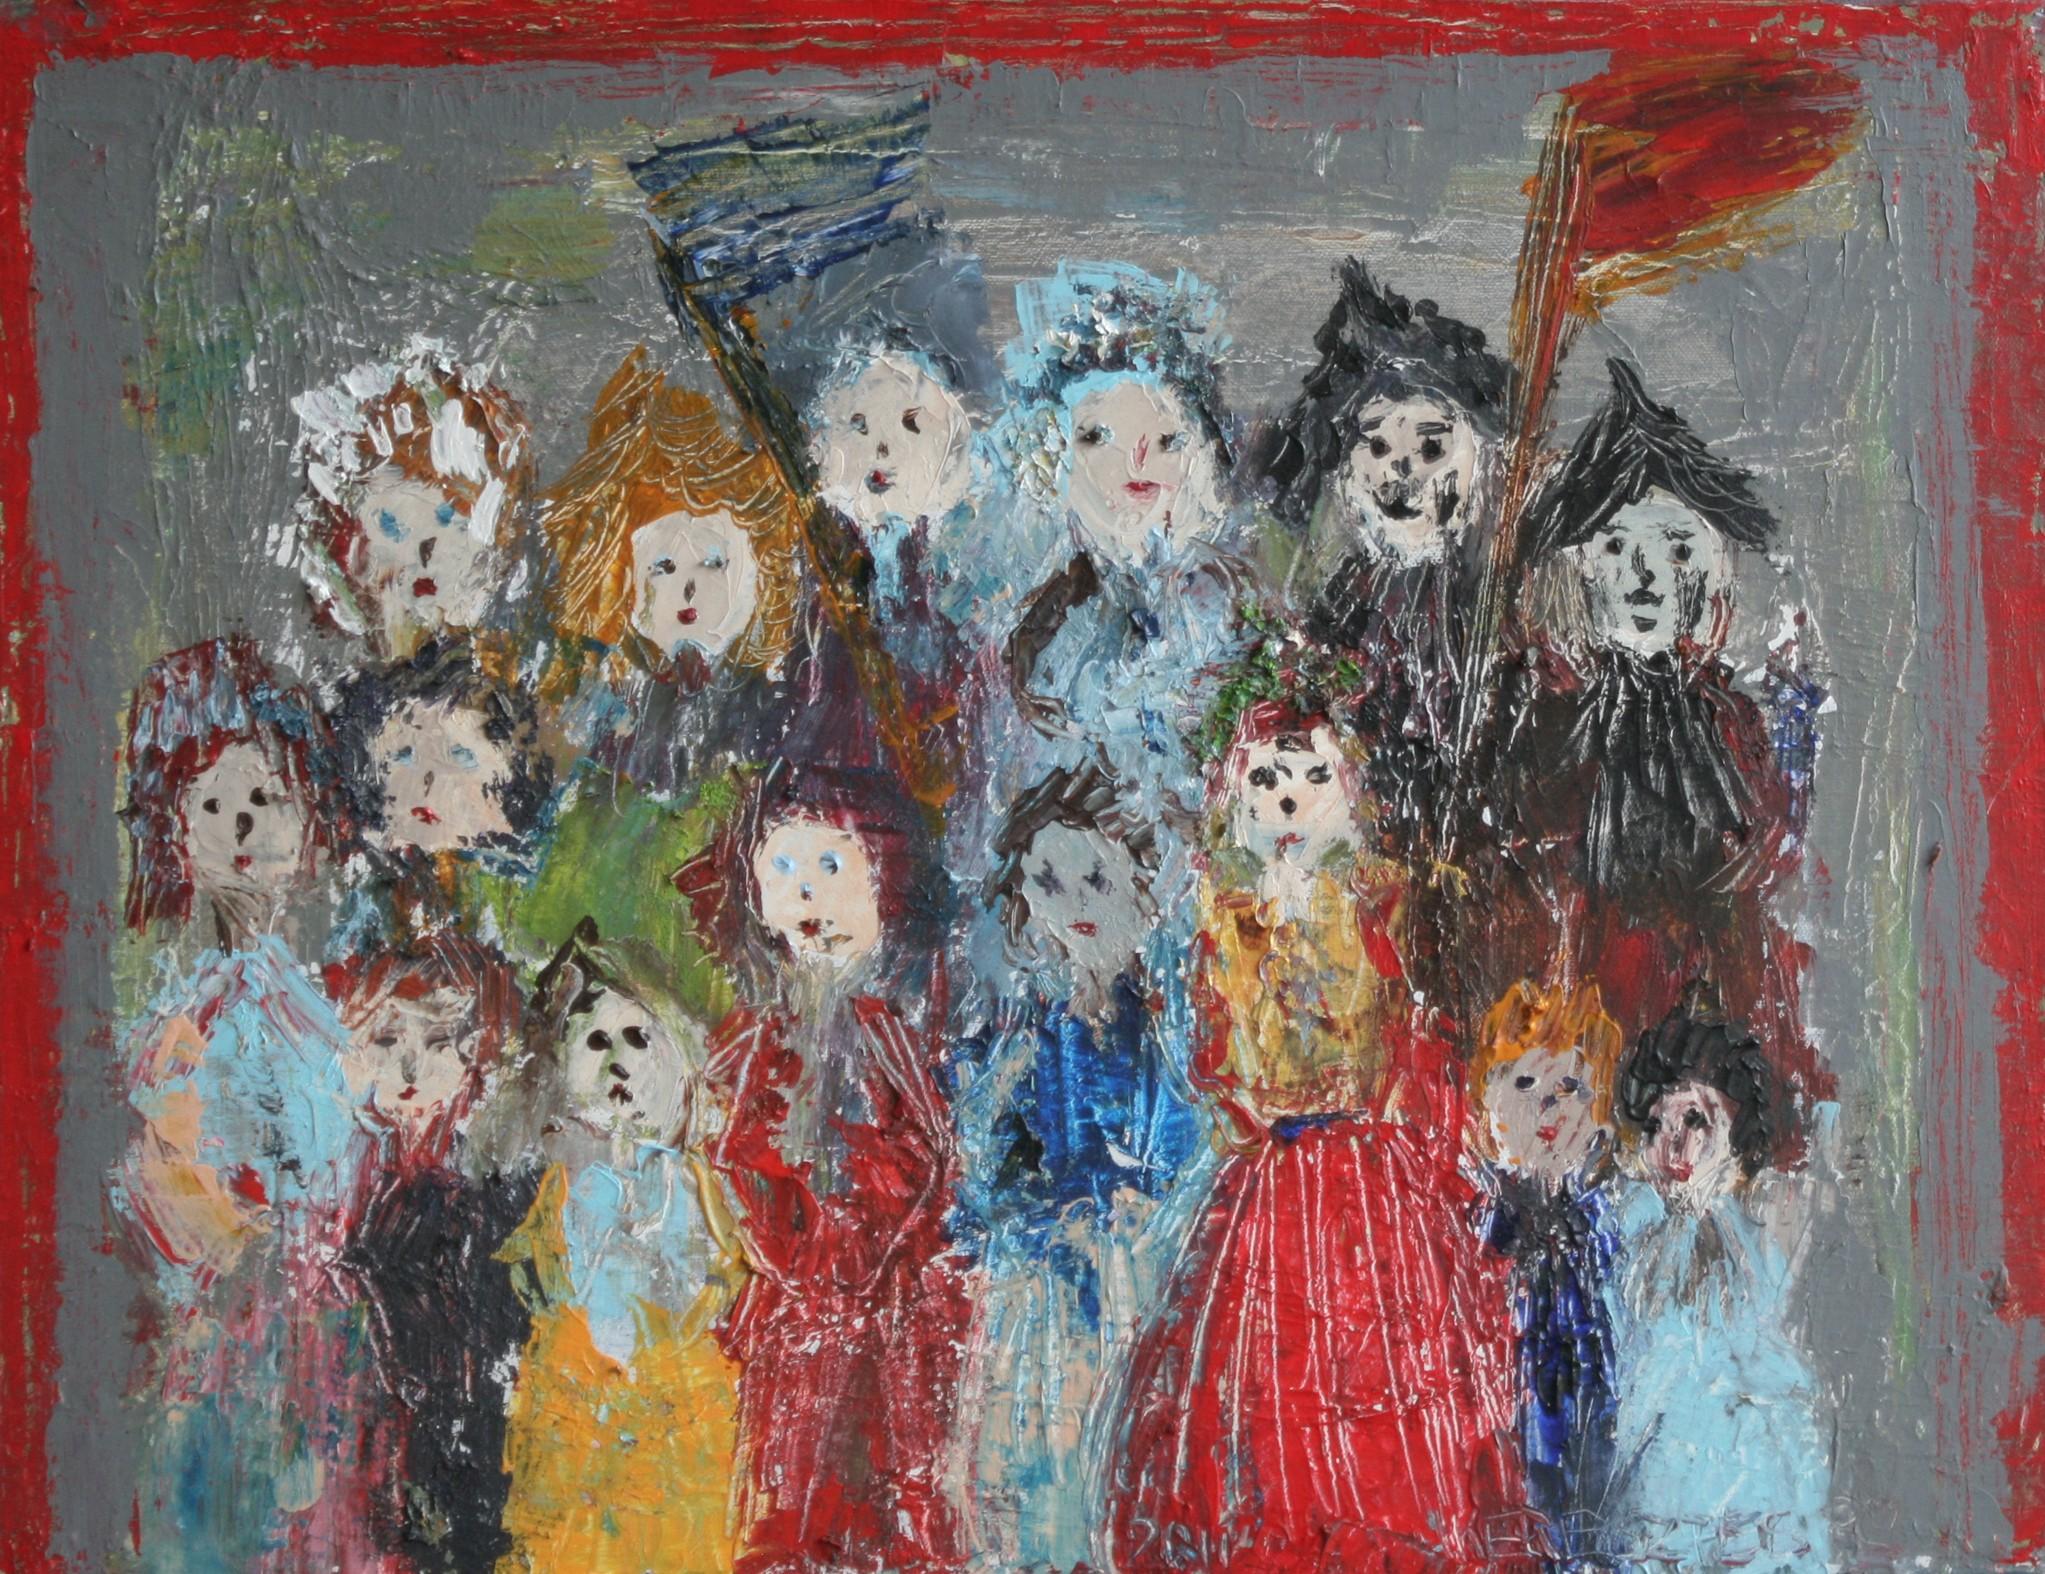 toile 43 - magdalena keresztes, artiste peintre à amiens